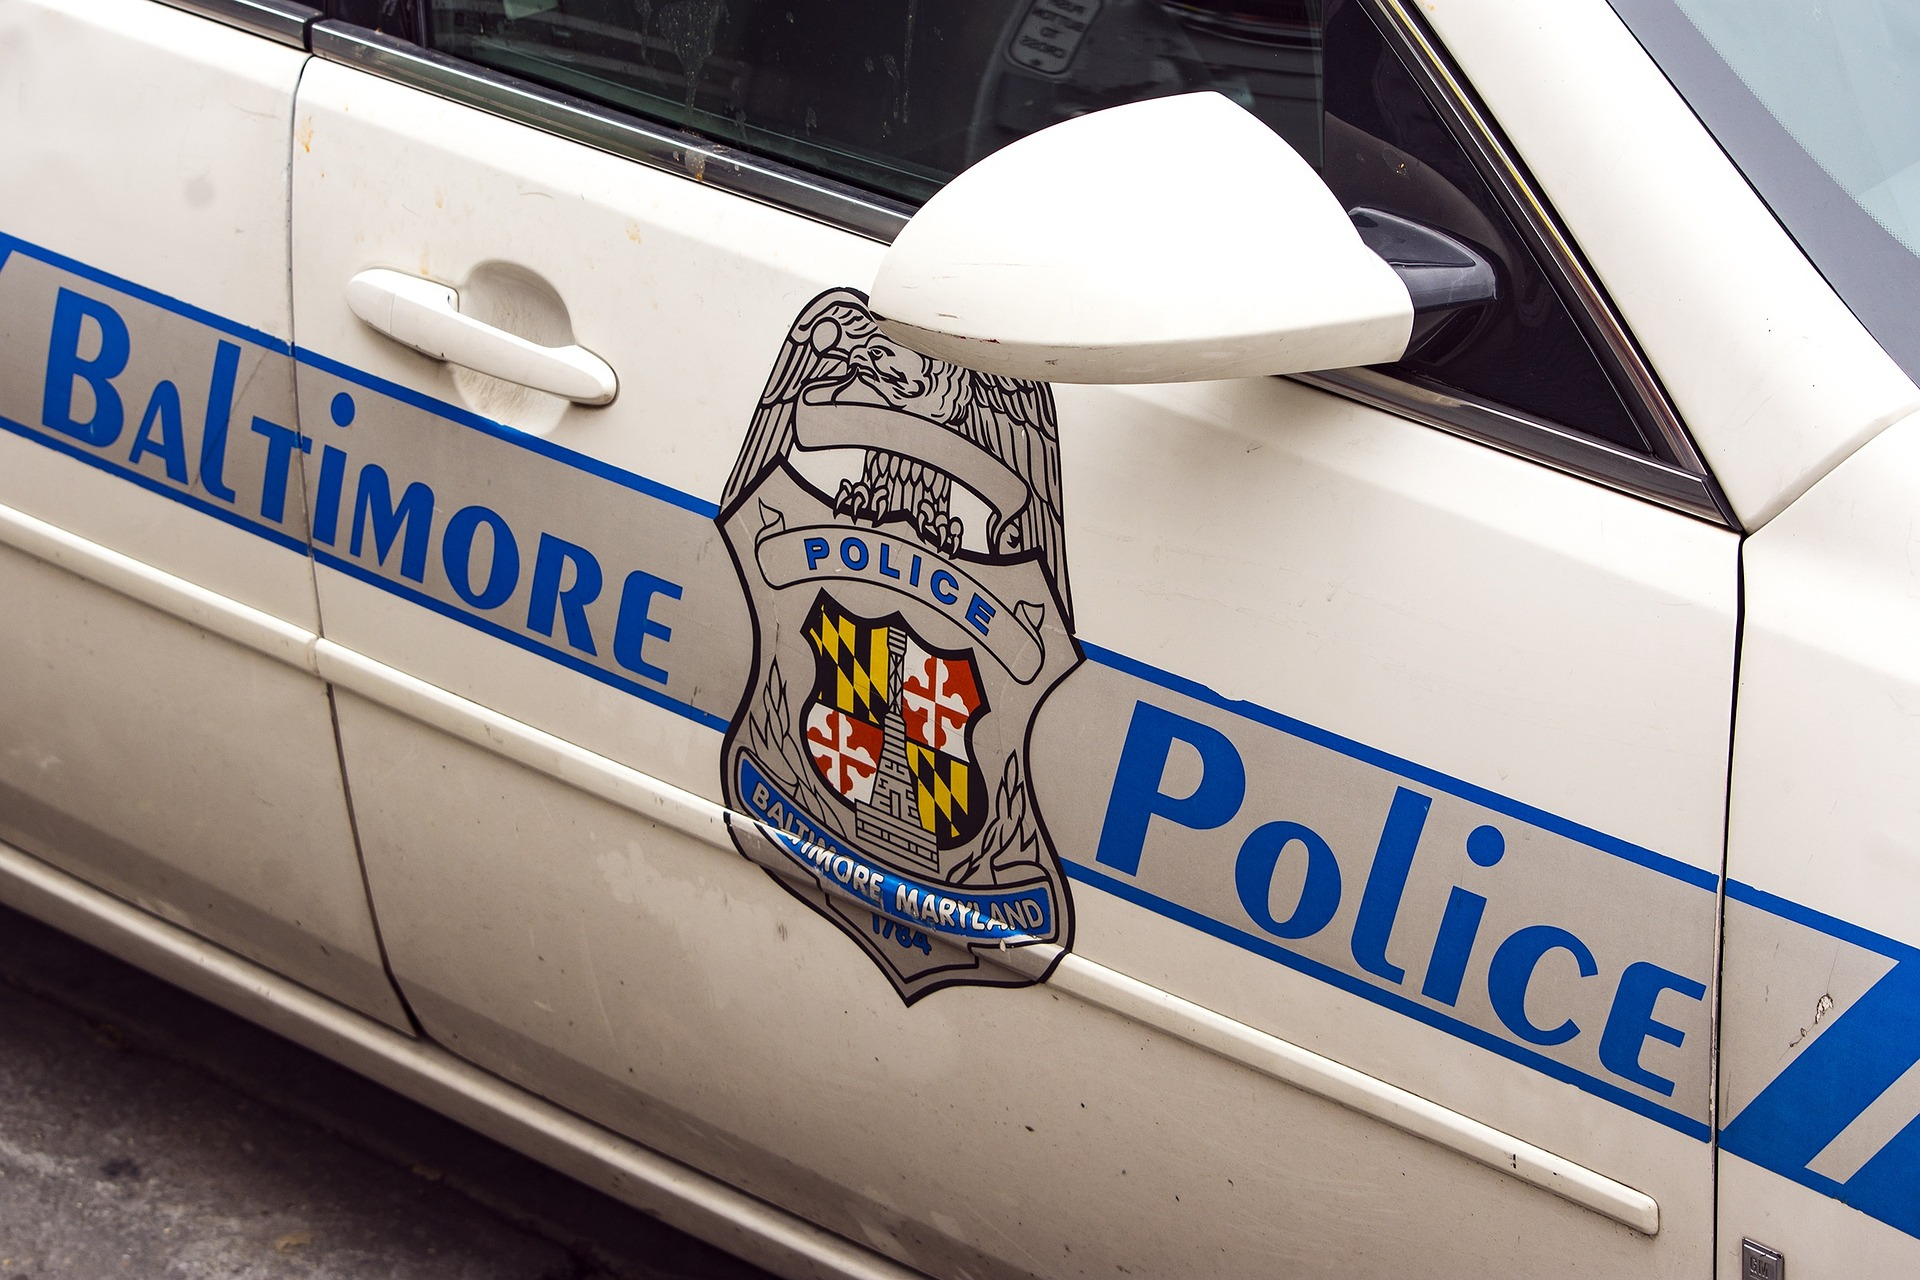 City Police Commissioner to Shake Up Staff, Organization